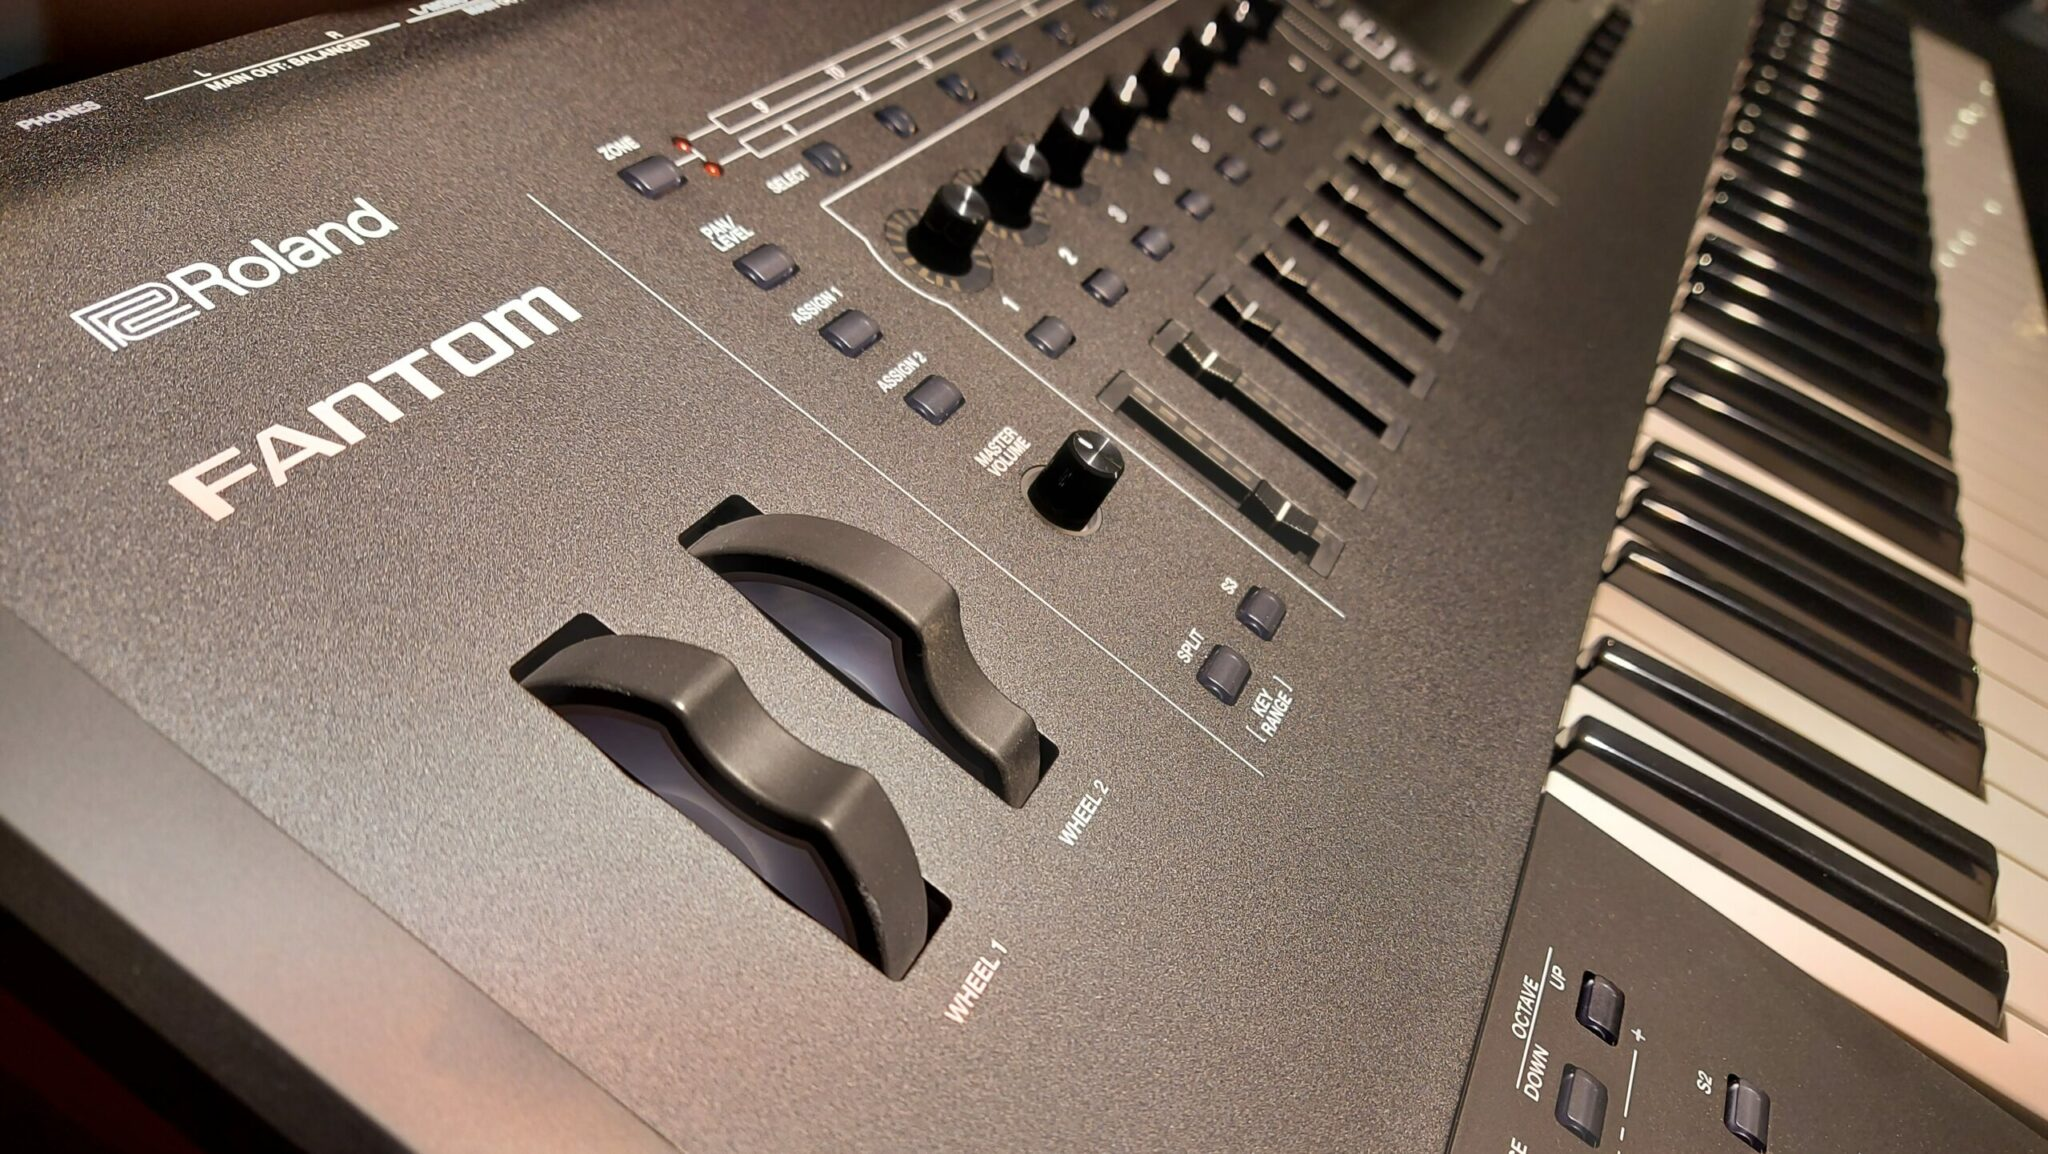 Roland Fantom update V2.10